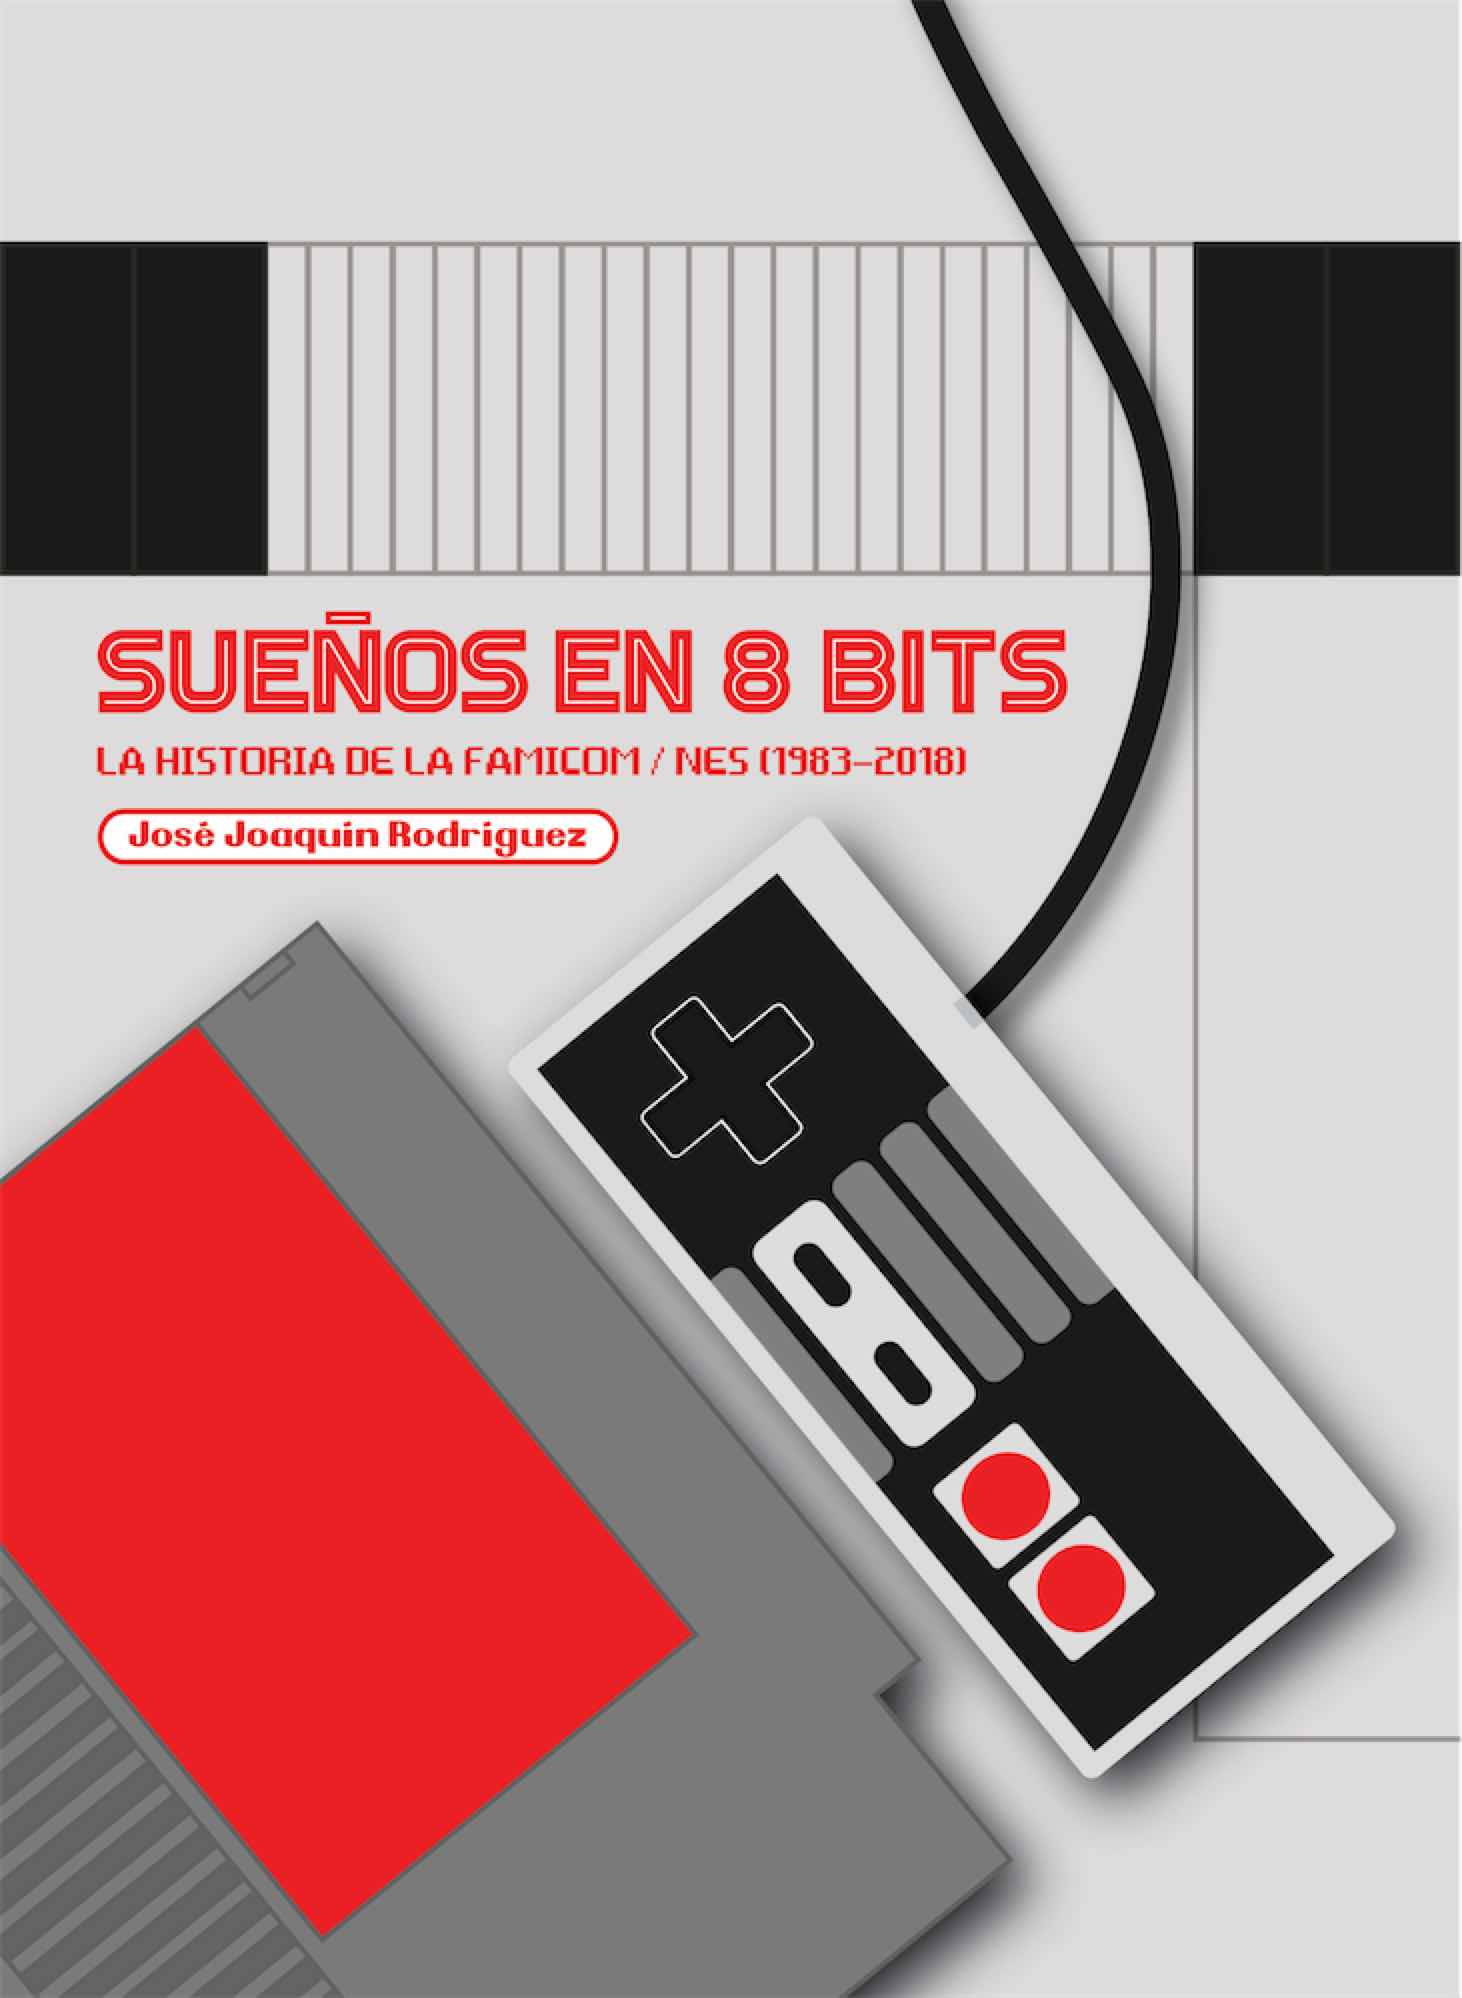 SUEÑOS EN 8 BITS: LA HISTORIA DE LA FAMICOM/NES (1983-2018)